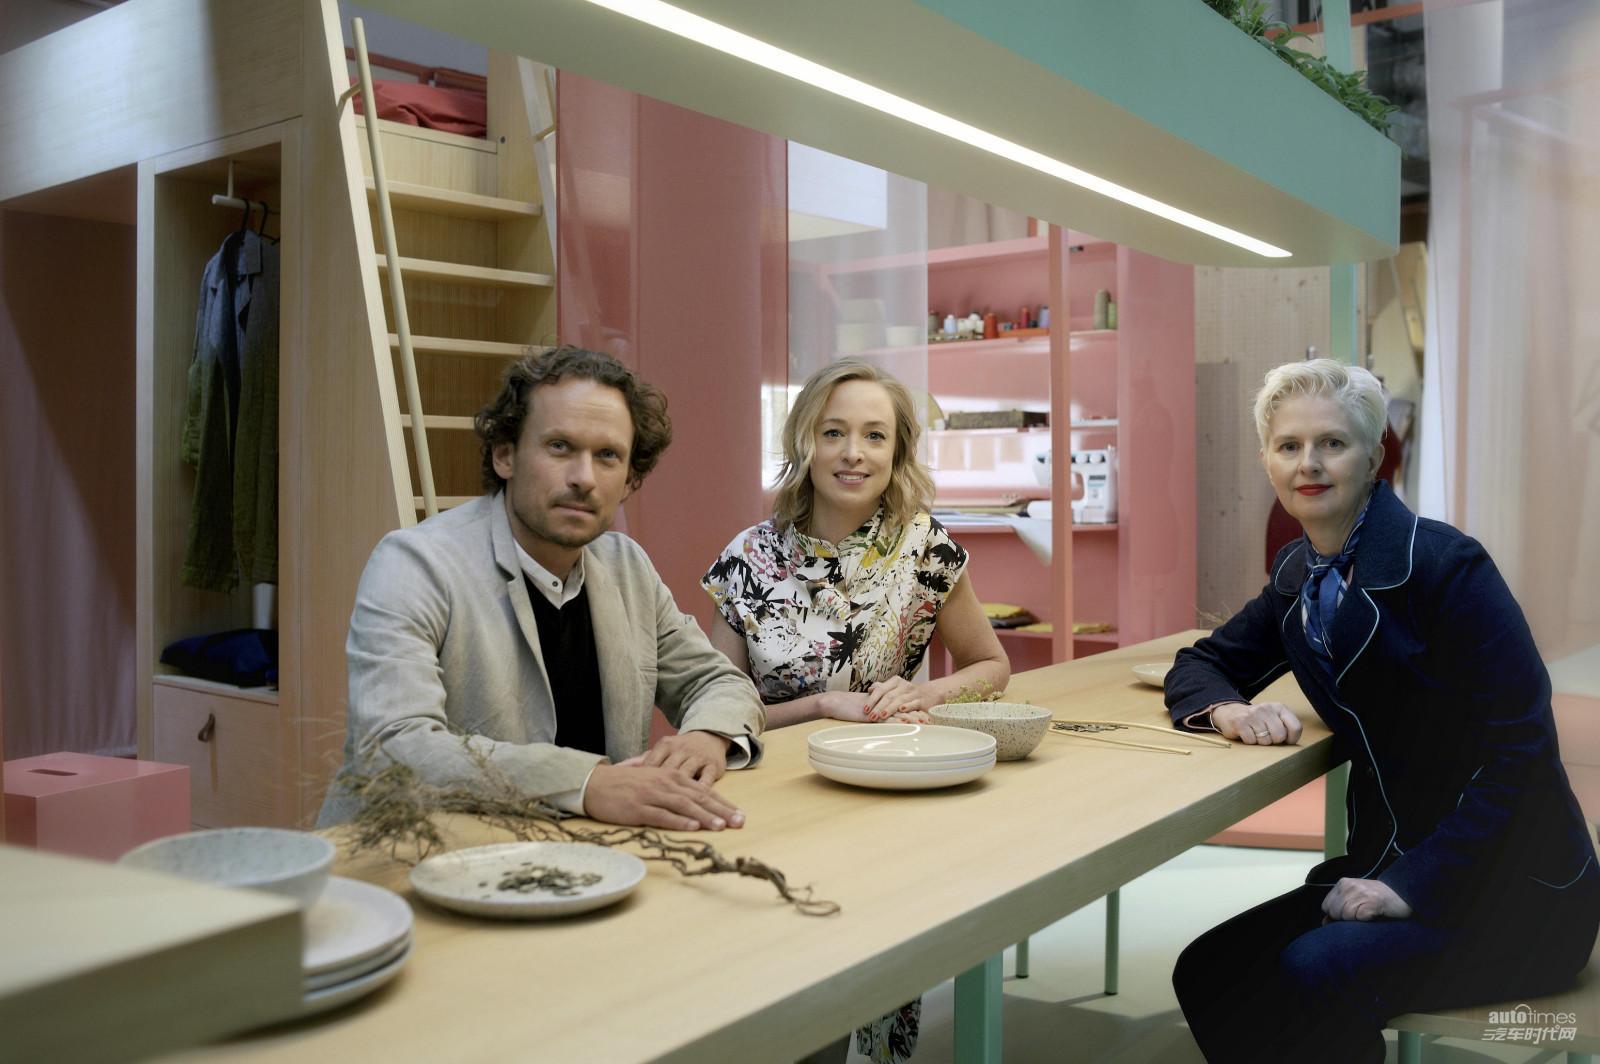 MINI品牌以前瞻居住生活理念亮相2018米兰国际家居展